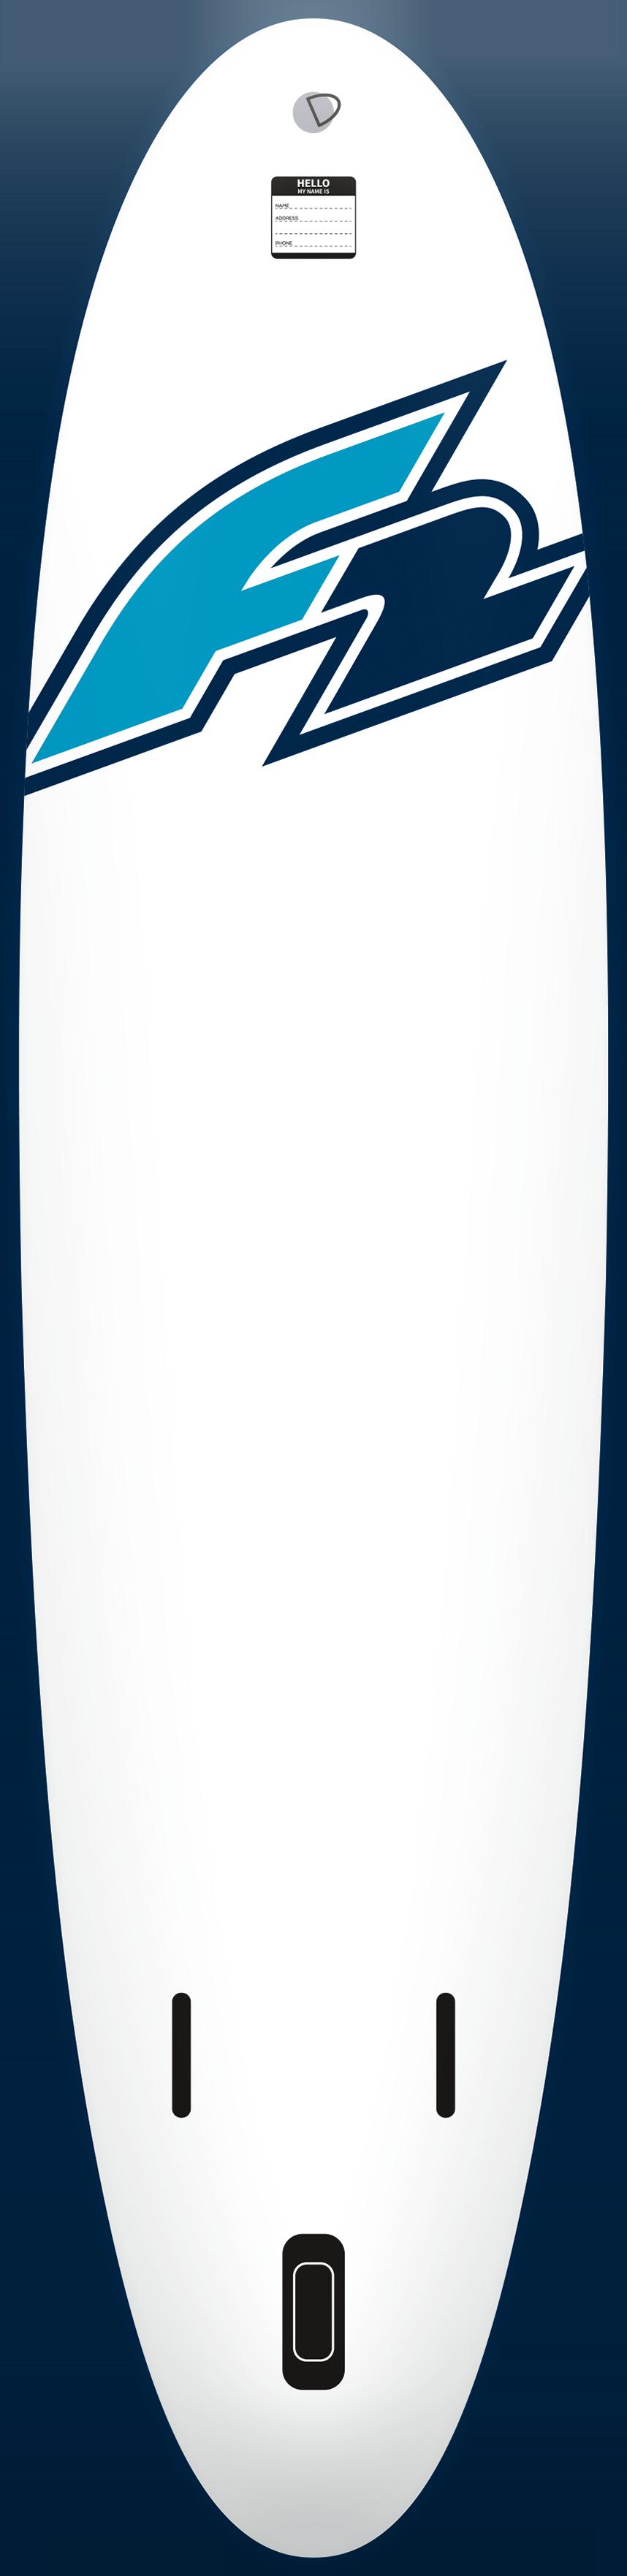 SECTOR BLUE - Base